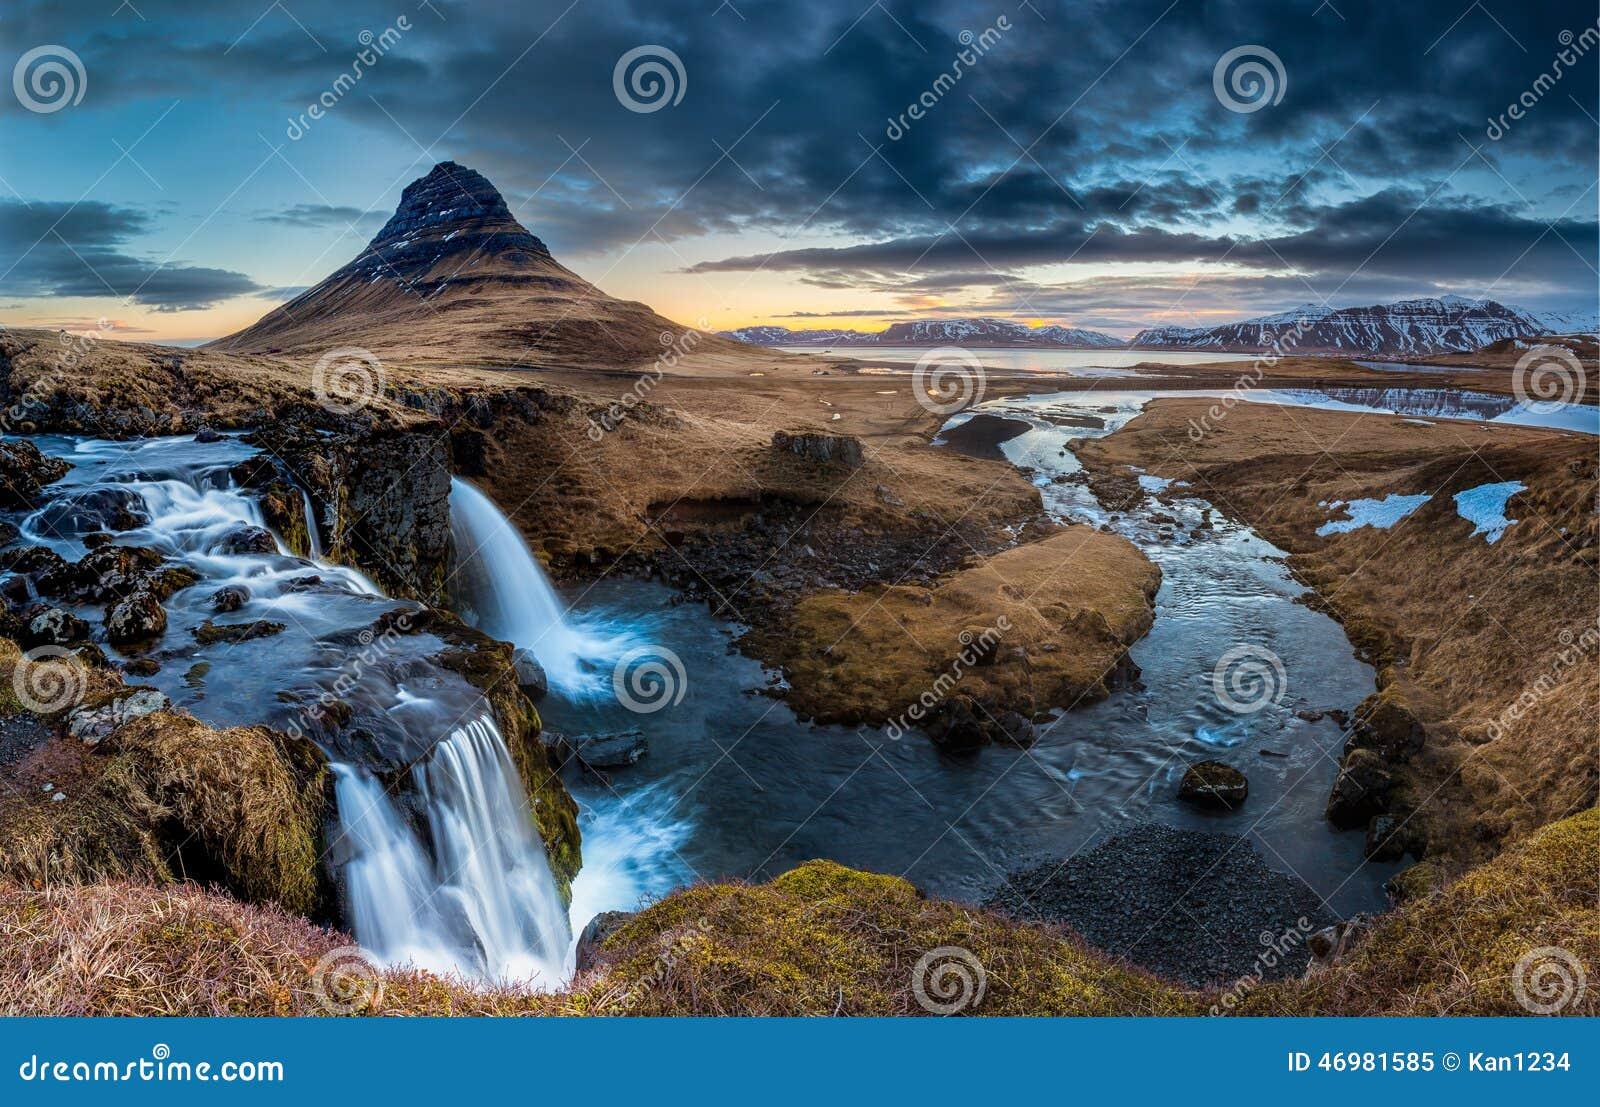 Paysage de l Islande - lever de soleil au Mt Kirkjufell